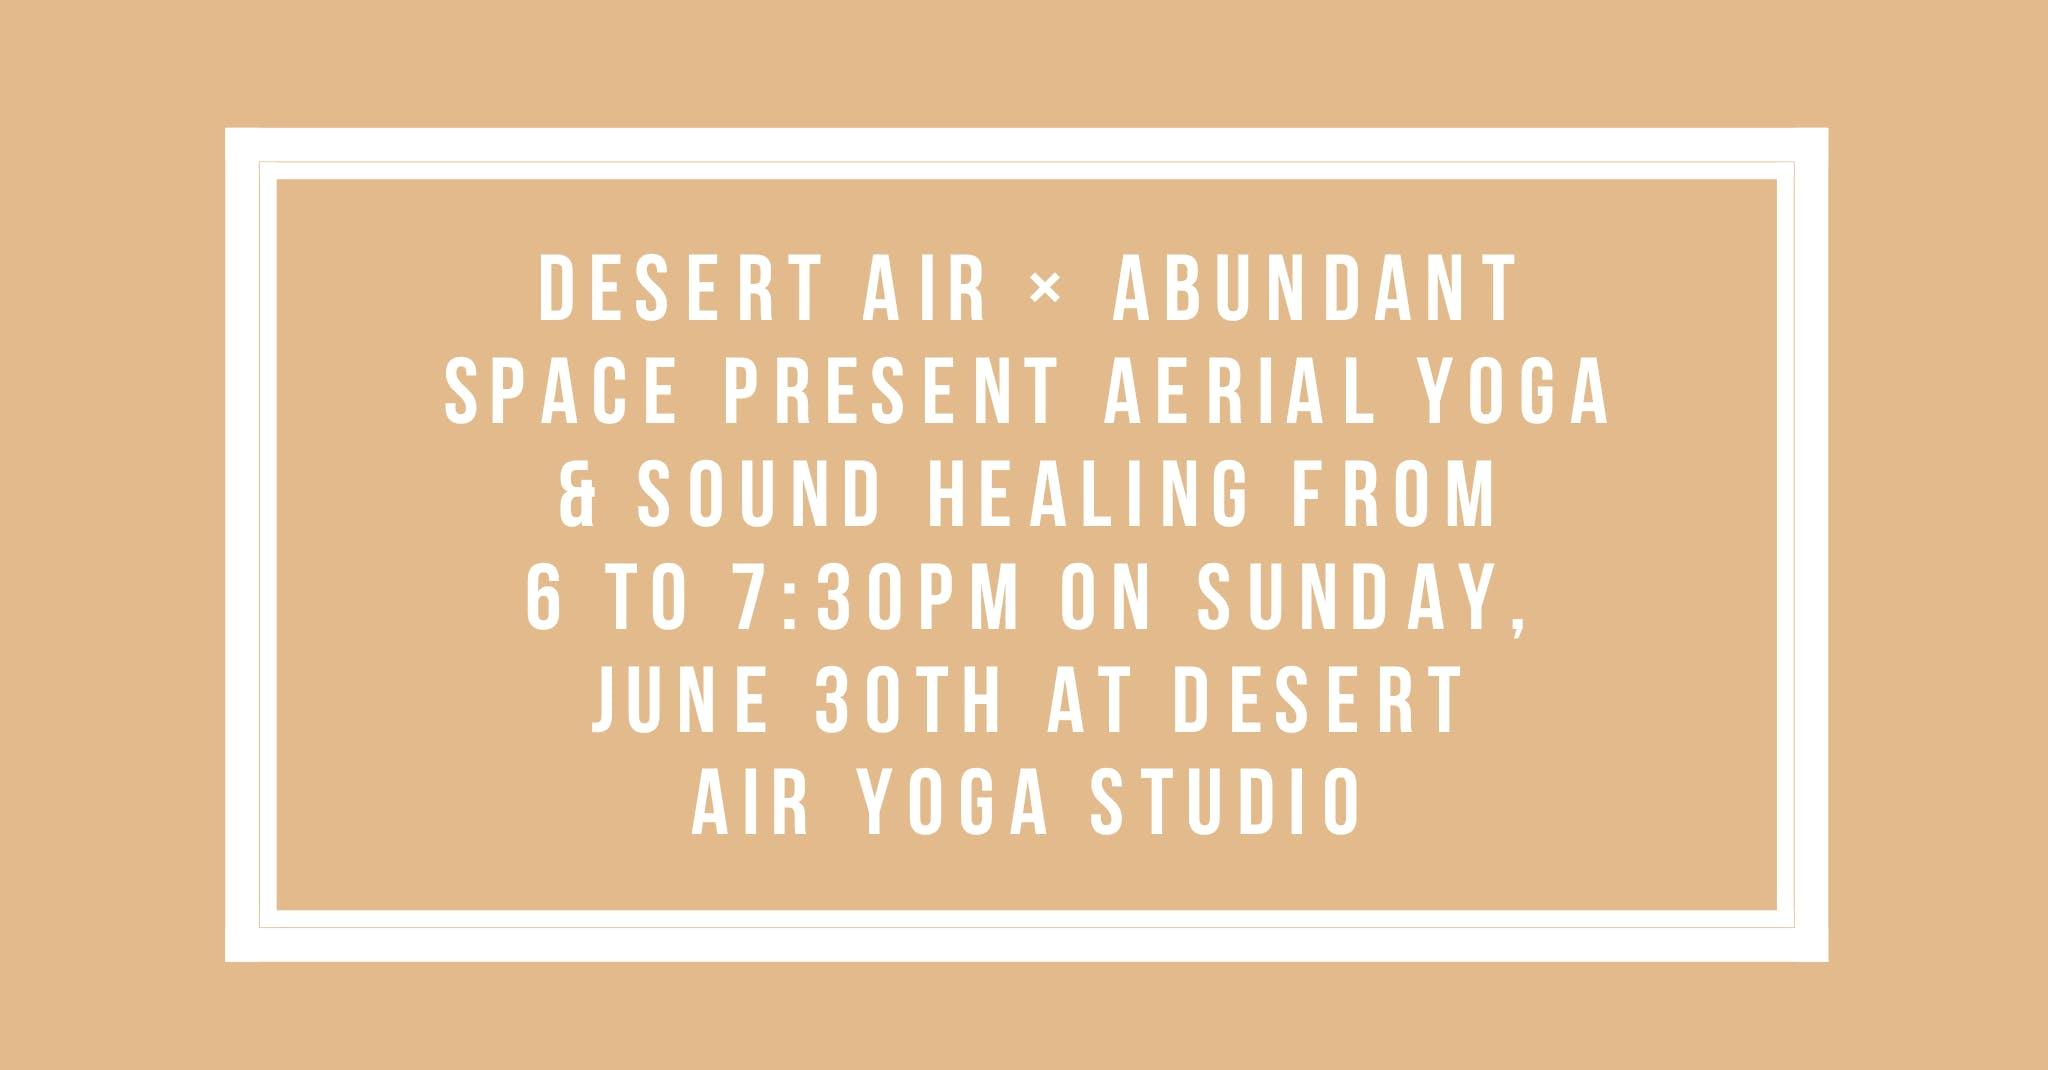 Aerial Yoga & Sound Healing